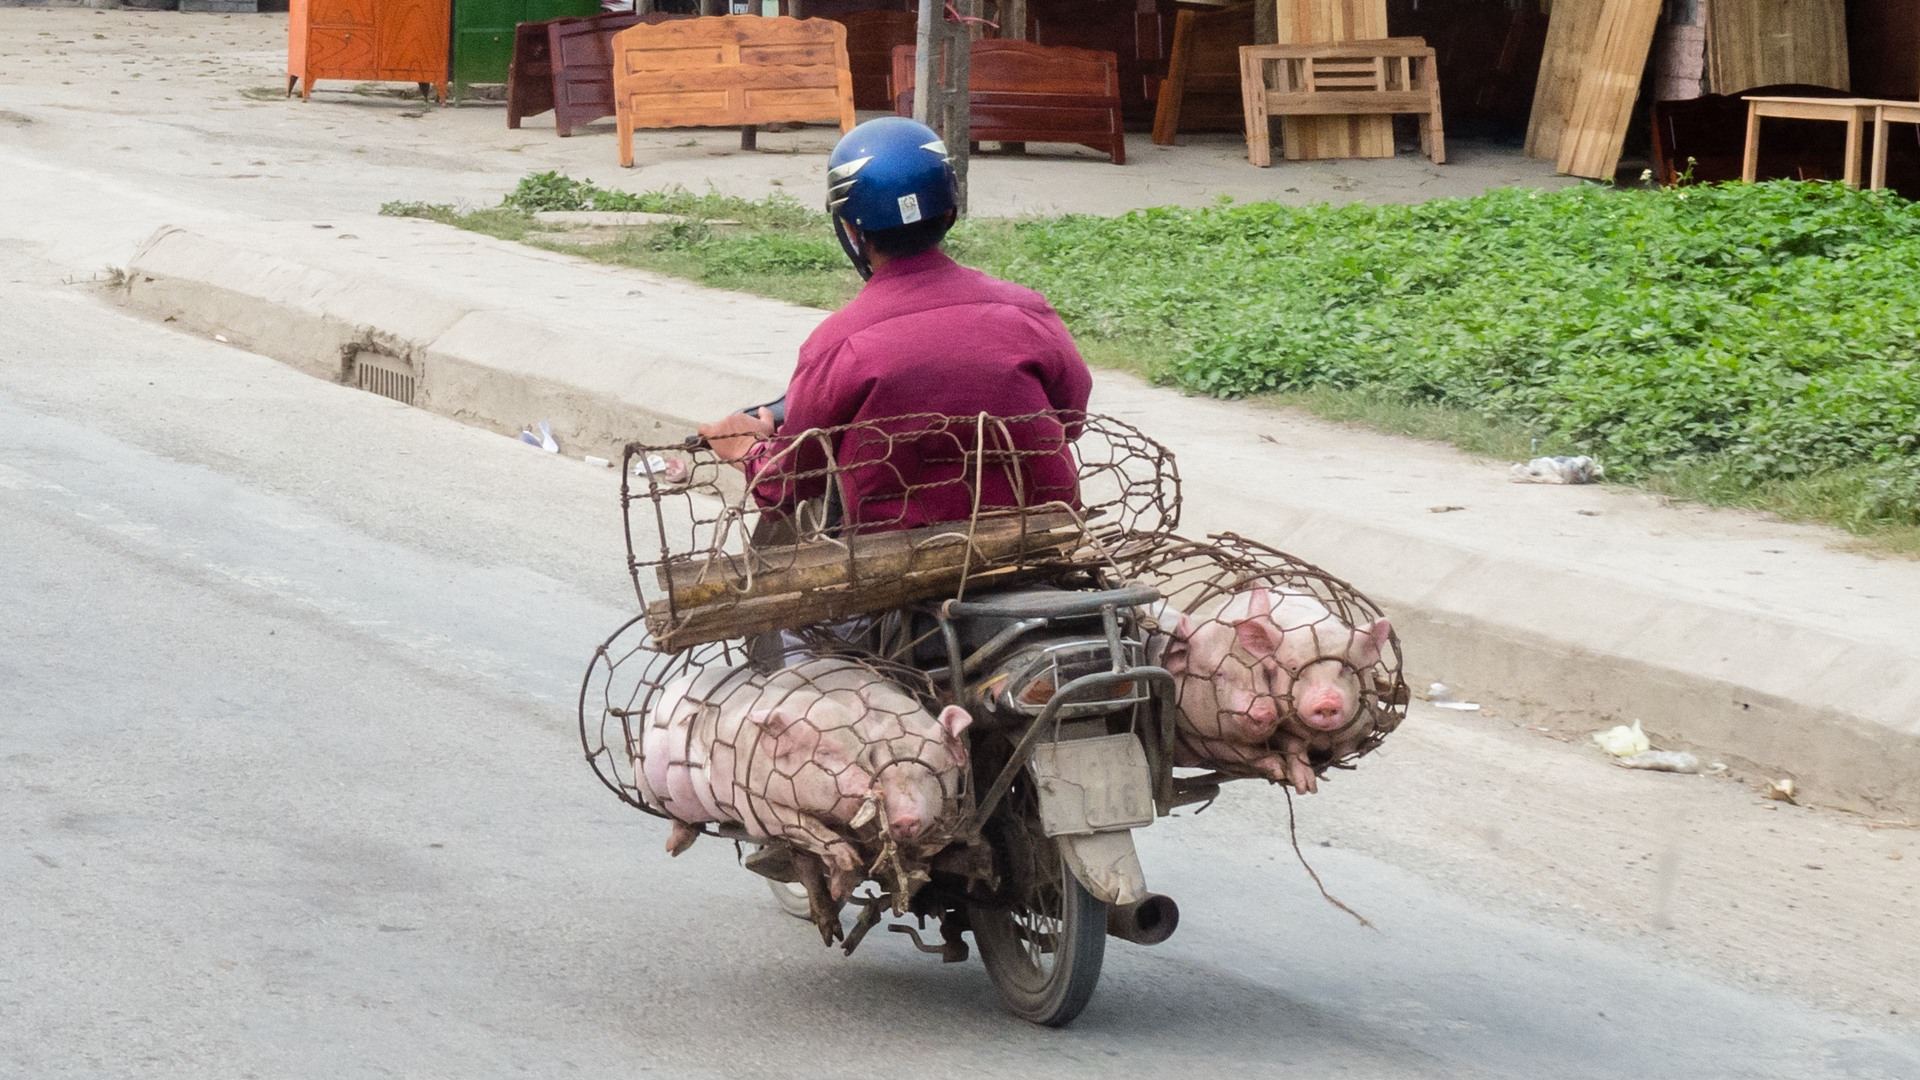 Перевозчик свиней, Вьетнам